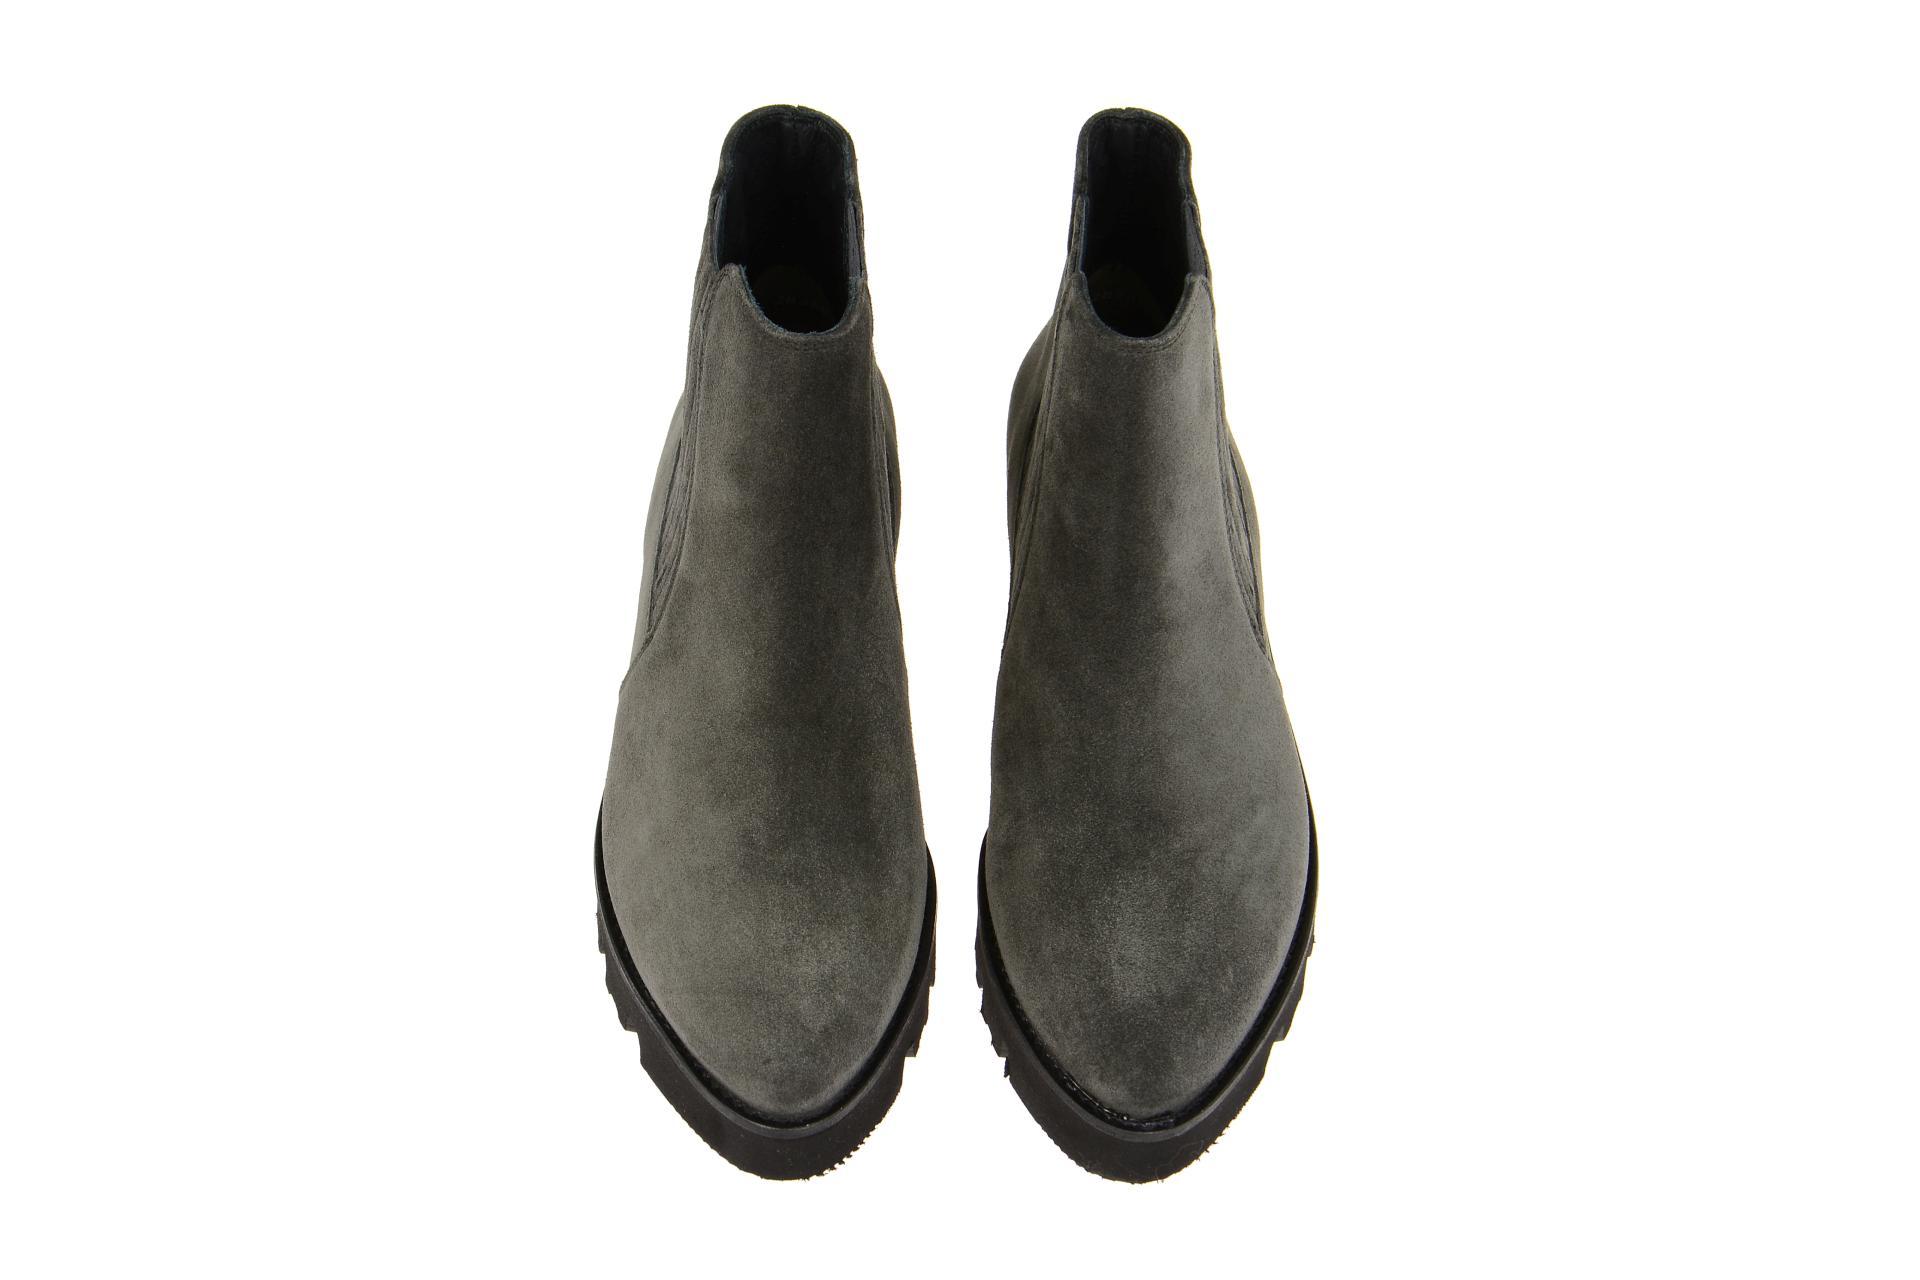 paul green stiefelette grau chelsea boots gr 37 8872 006. Black Bedroom Furniture Sets. Home Design Ideas